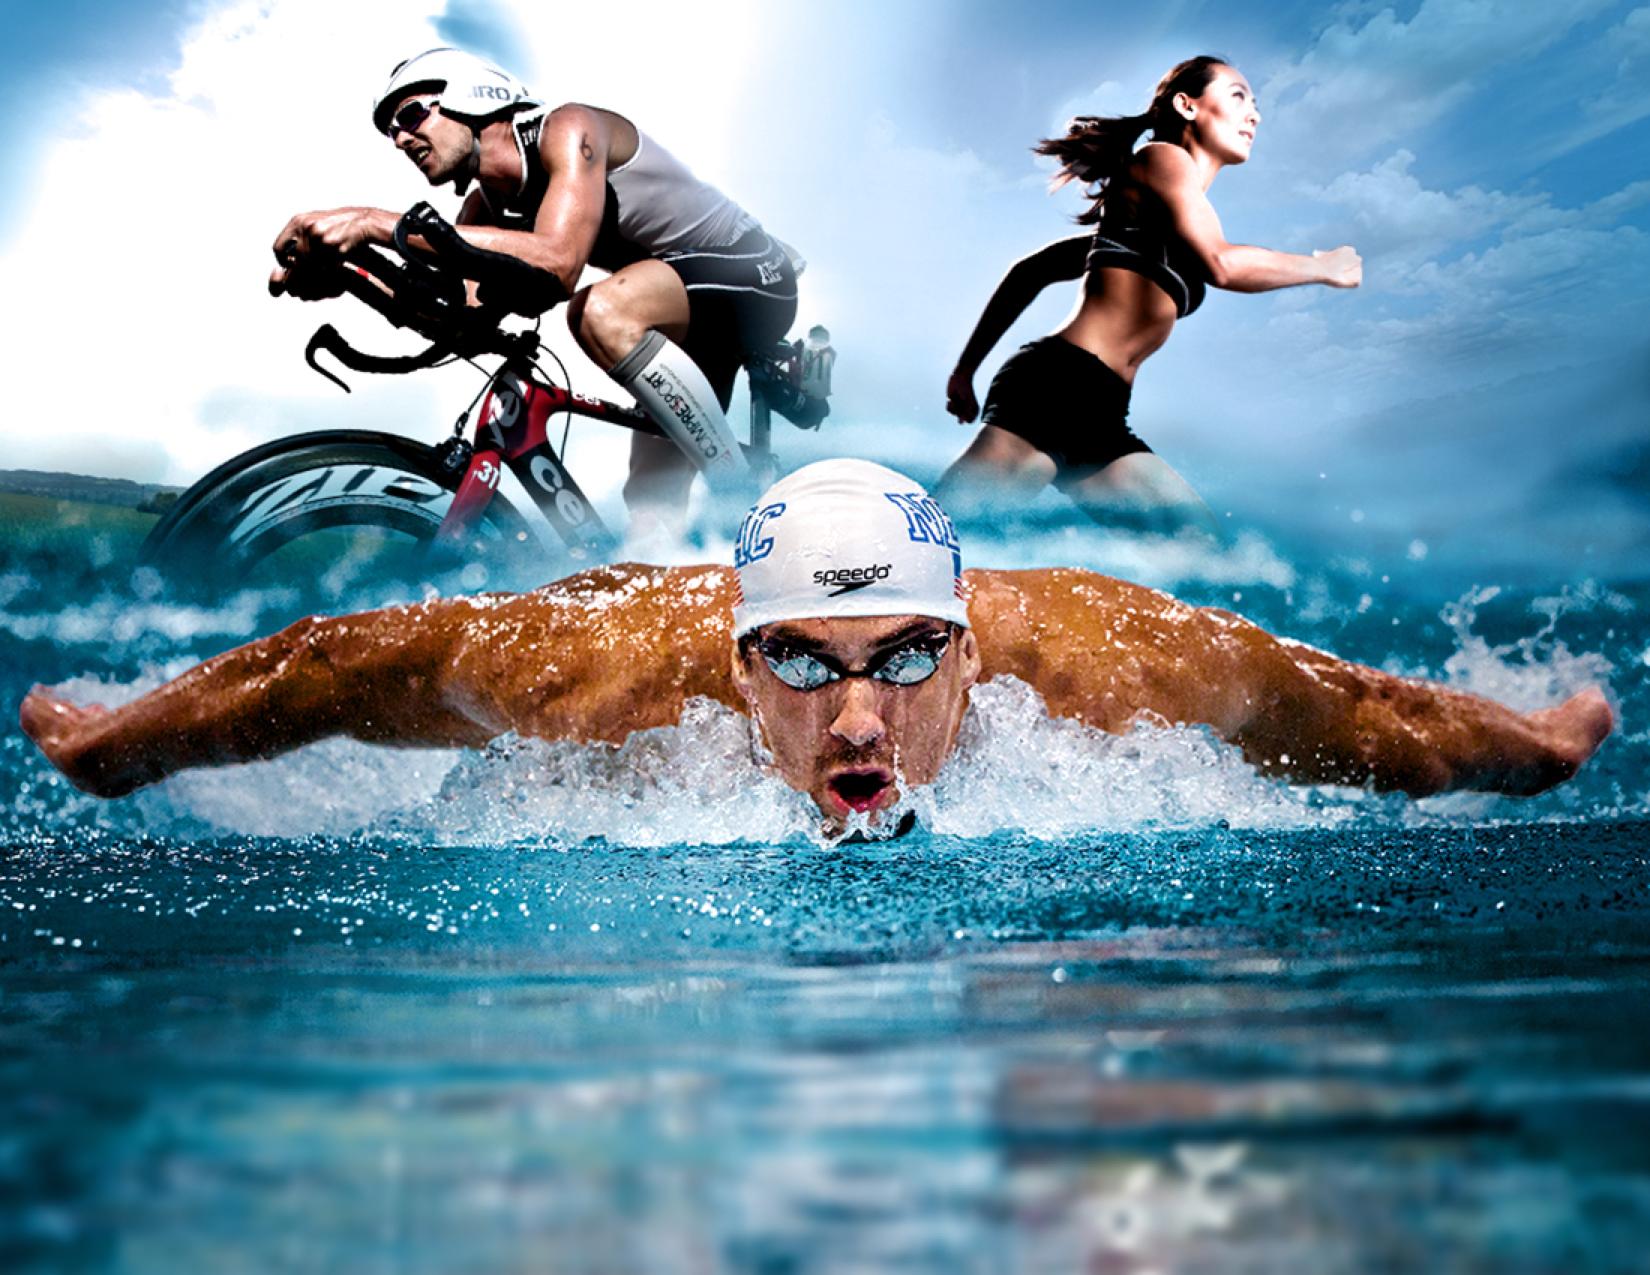 Endurance / Performance